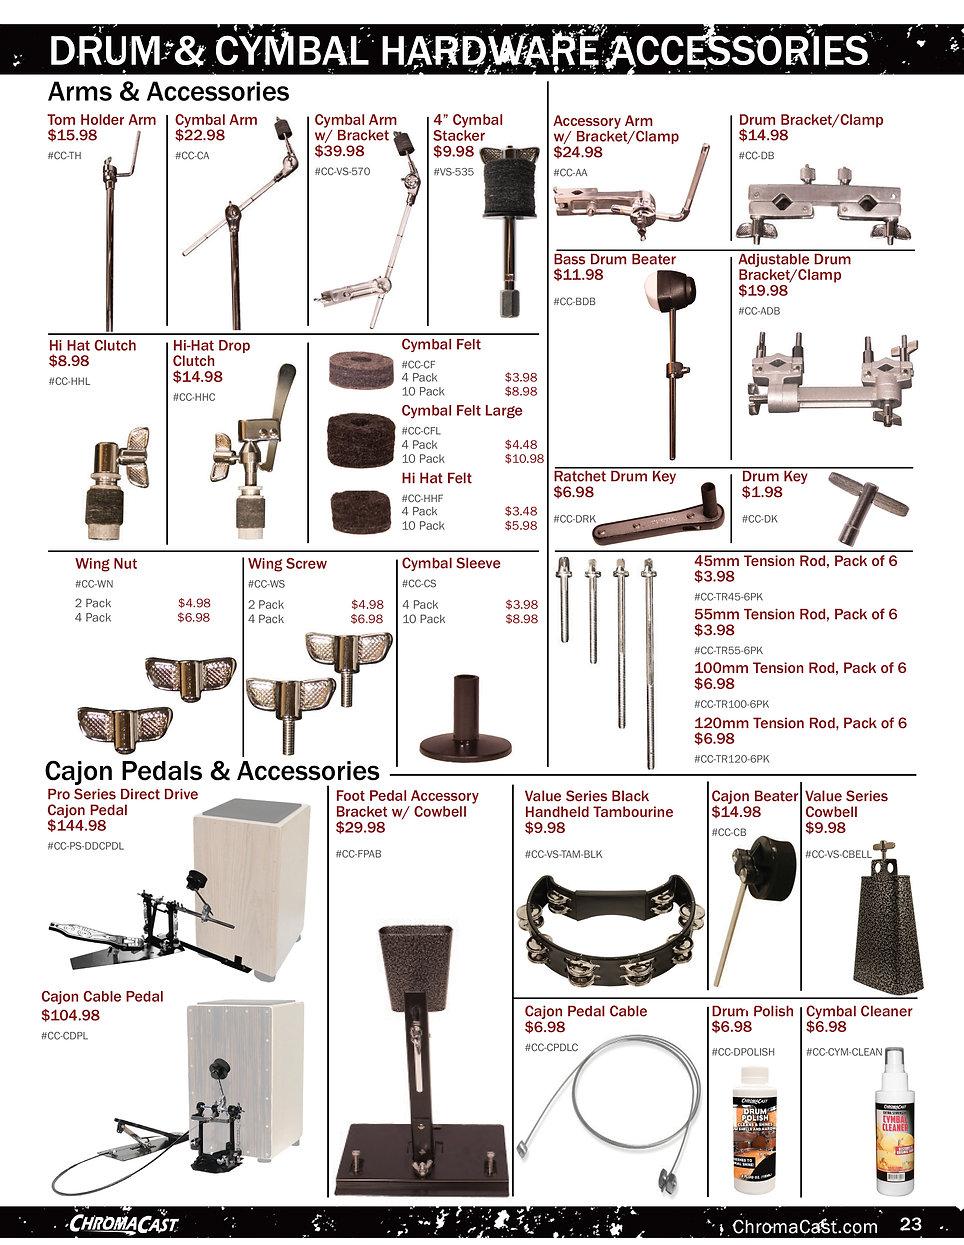 23-drum-and-hardware.jpg